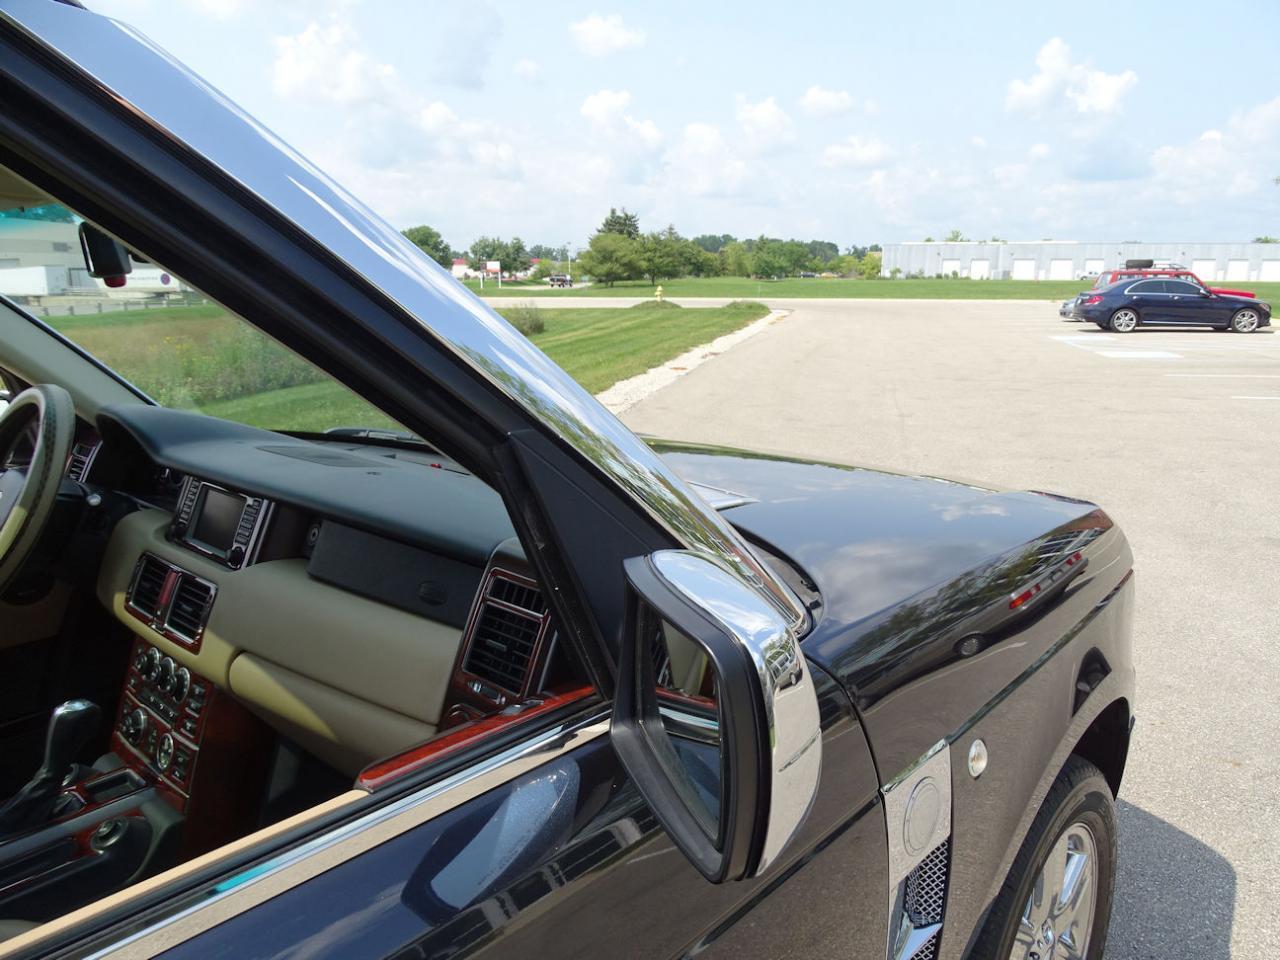 2003 Land Rover Range Rover (CC-1342108) for sale in O'Fallon, Illinois